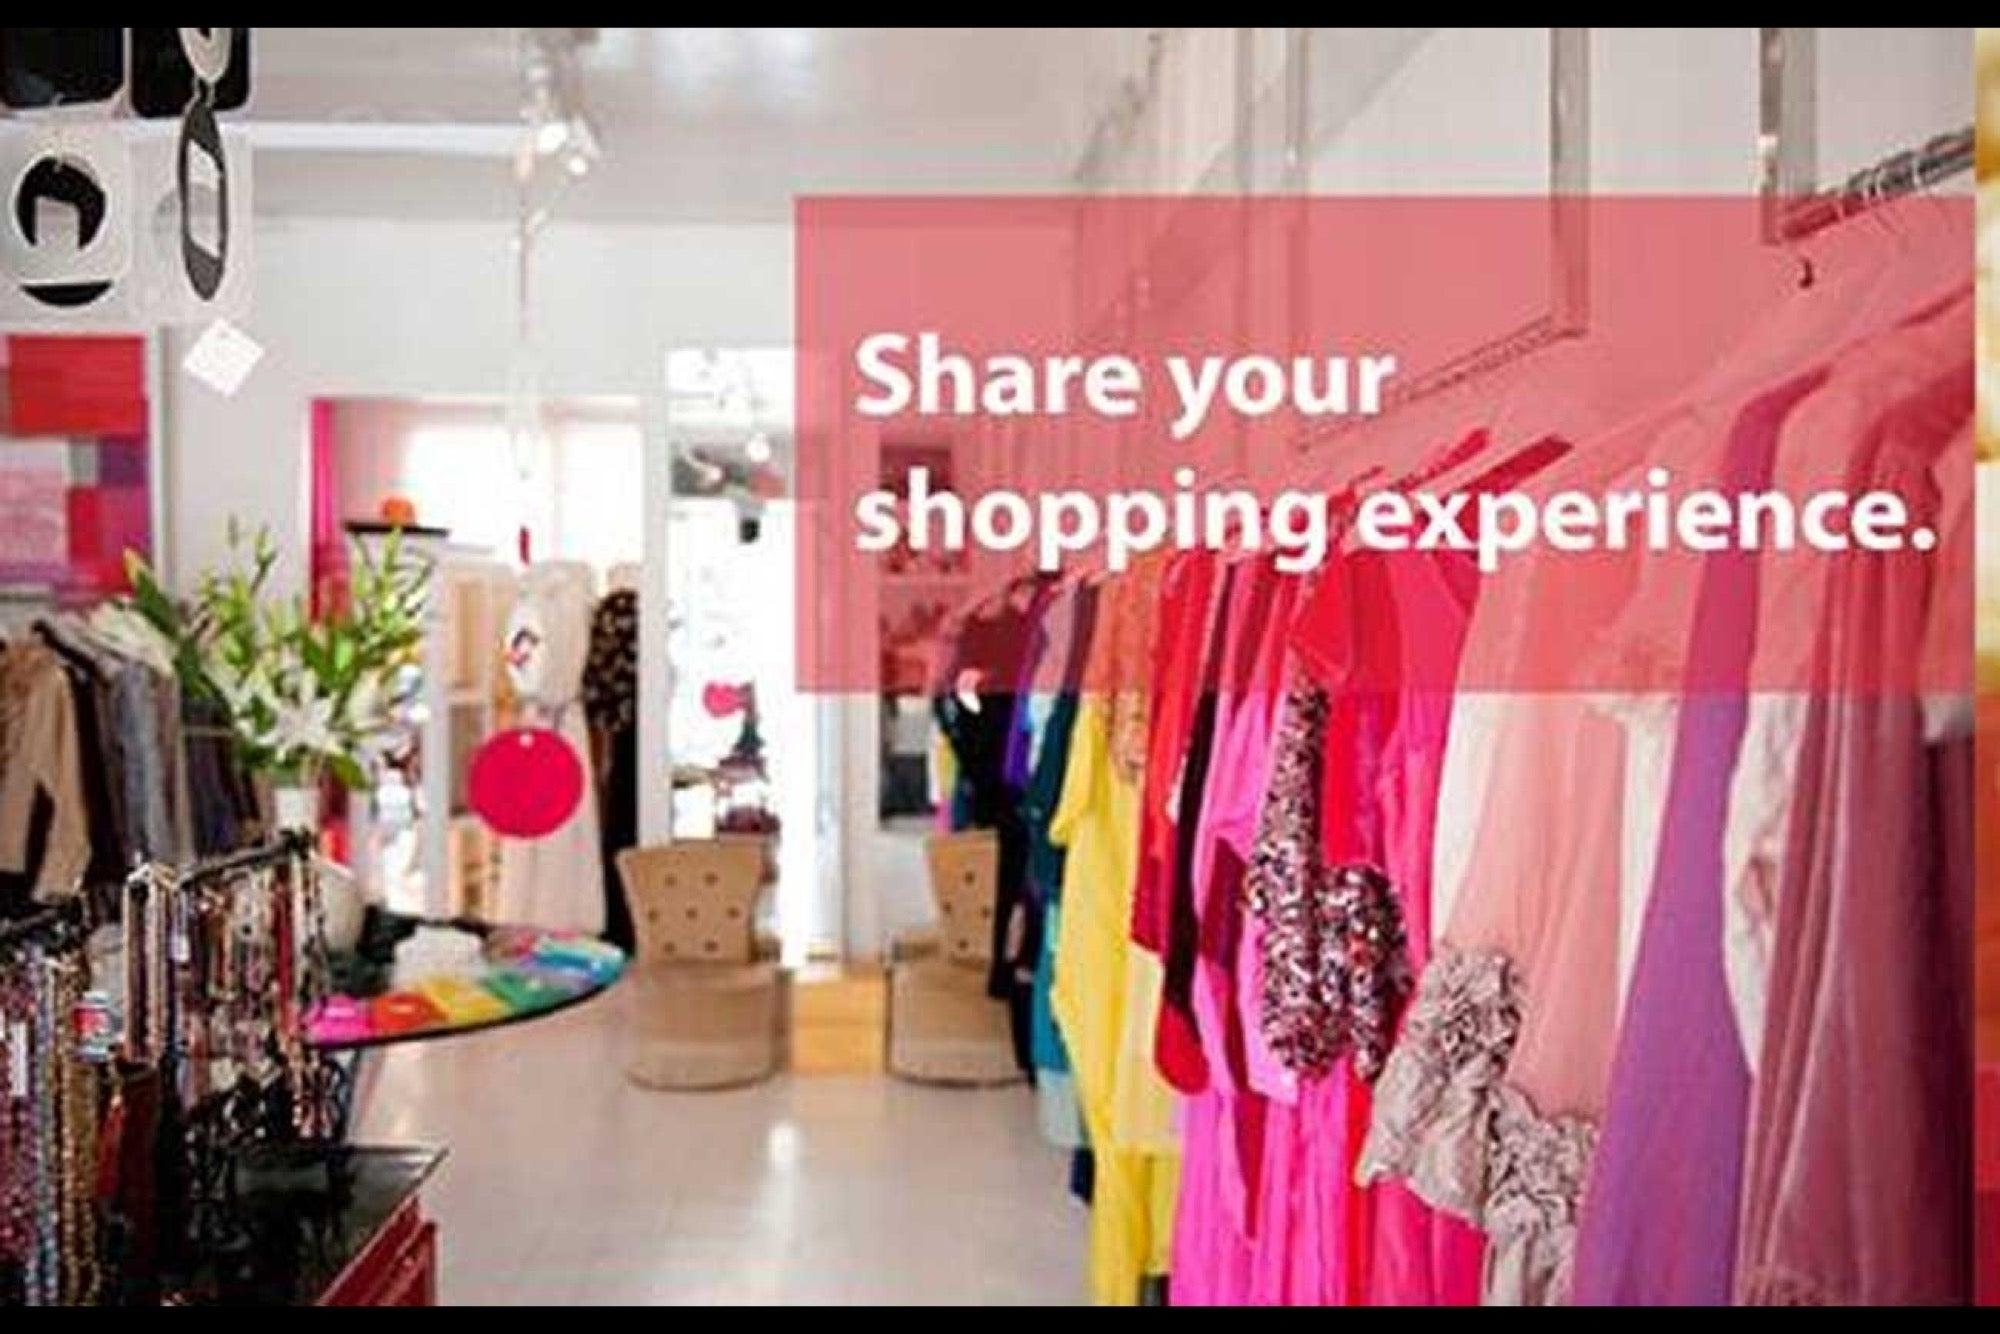 Zomato for fashion, Zakoopi aggregates offline clothing